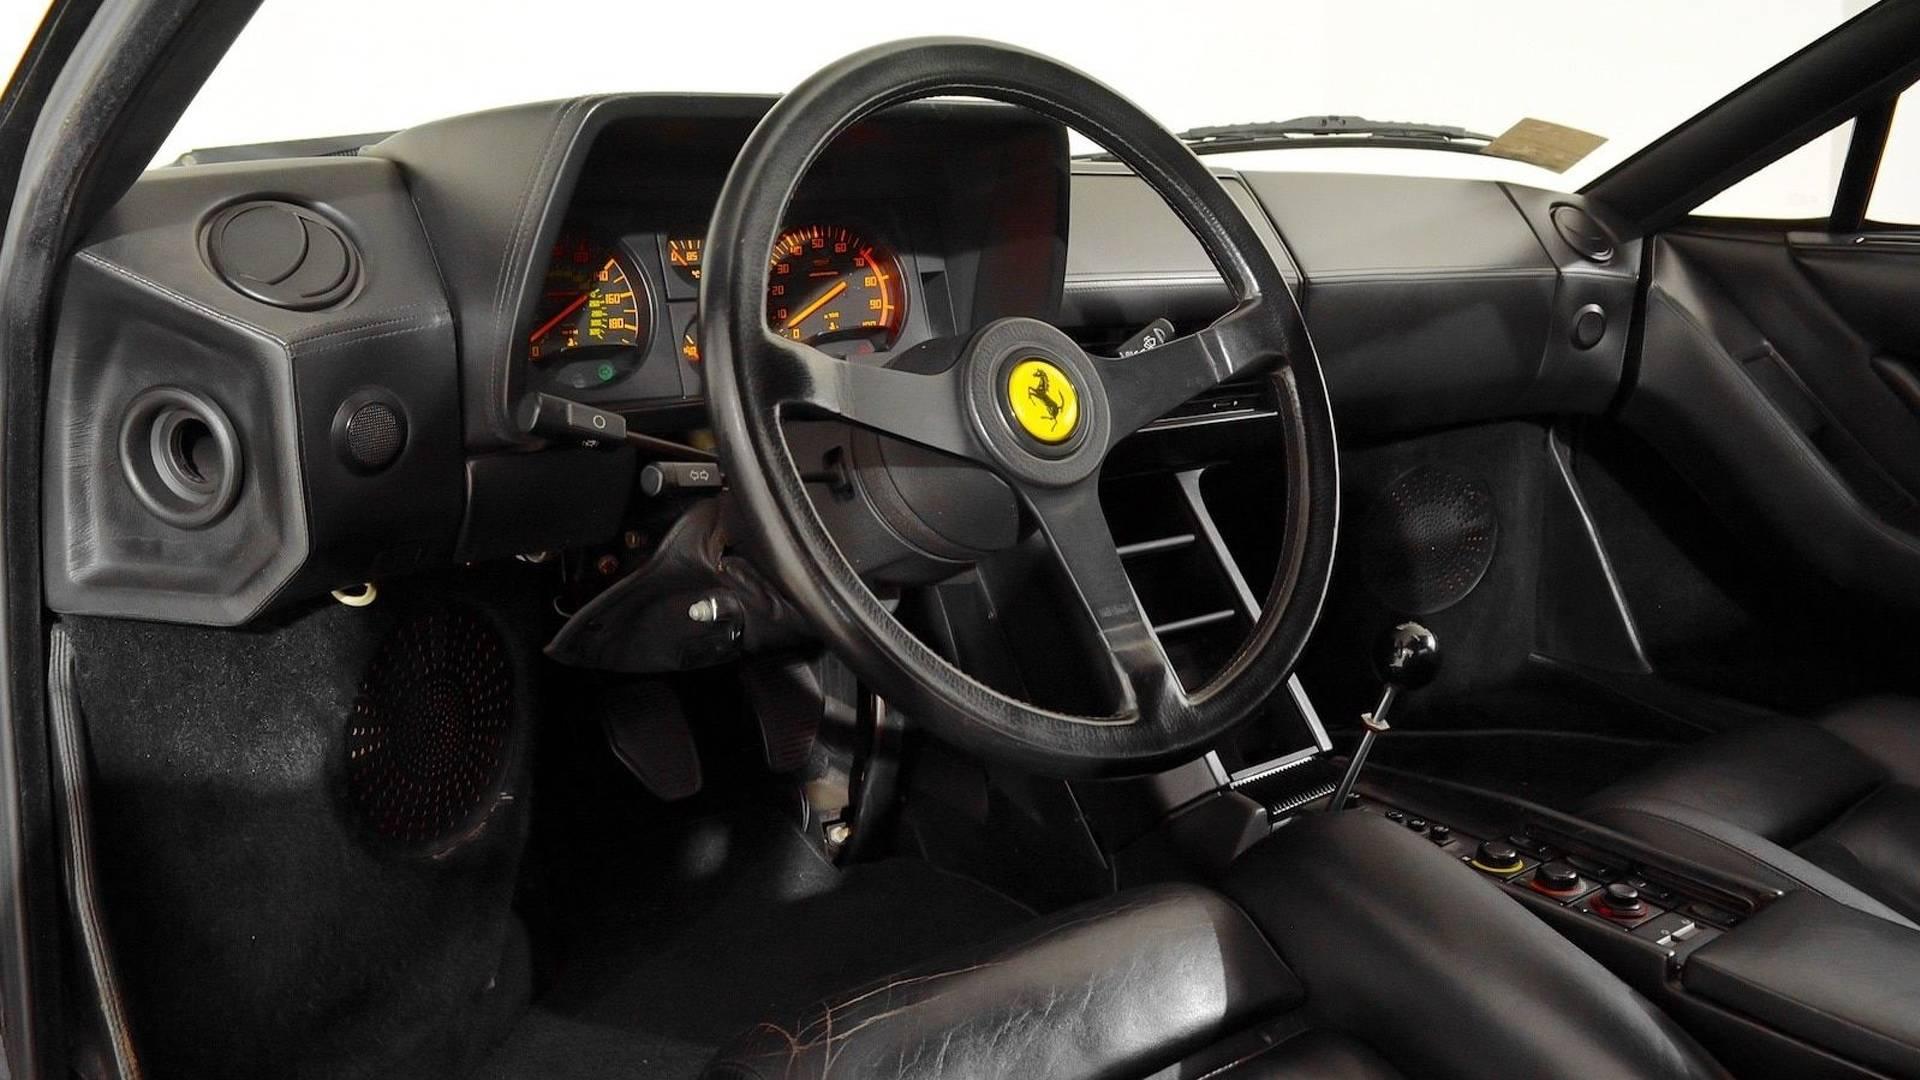 http://www.motormania.com.ua/wp-content/uploads/2017/12/1986-ferrari-testarossa-convertible-3.jpg